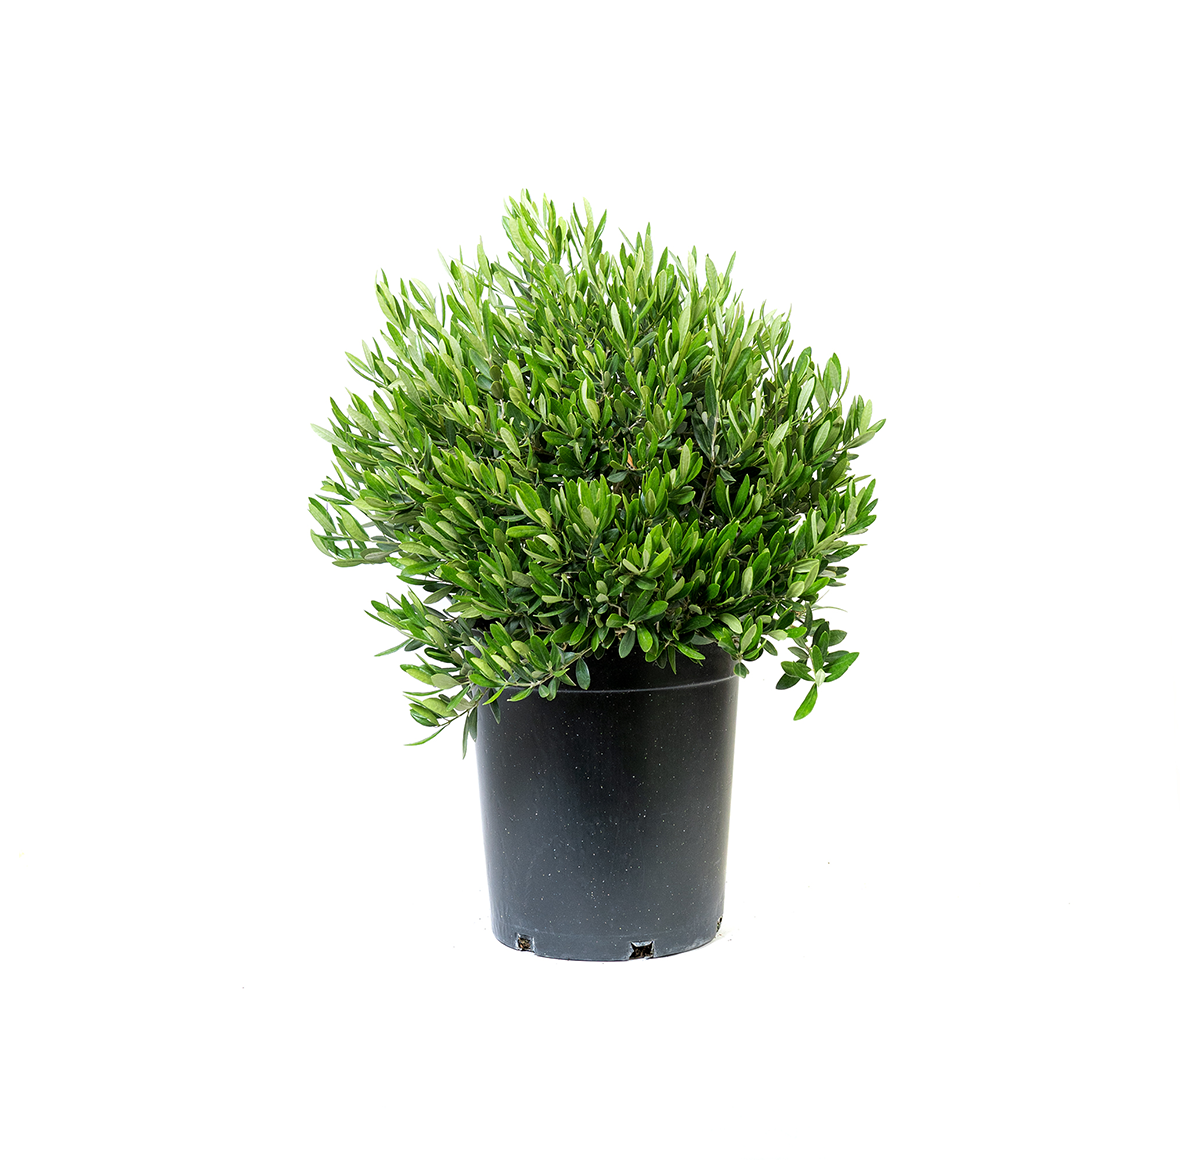 dwarf olive shrub in a black nursery container